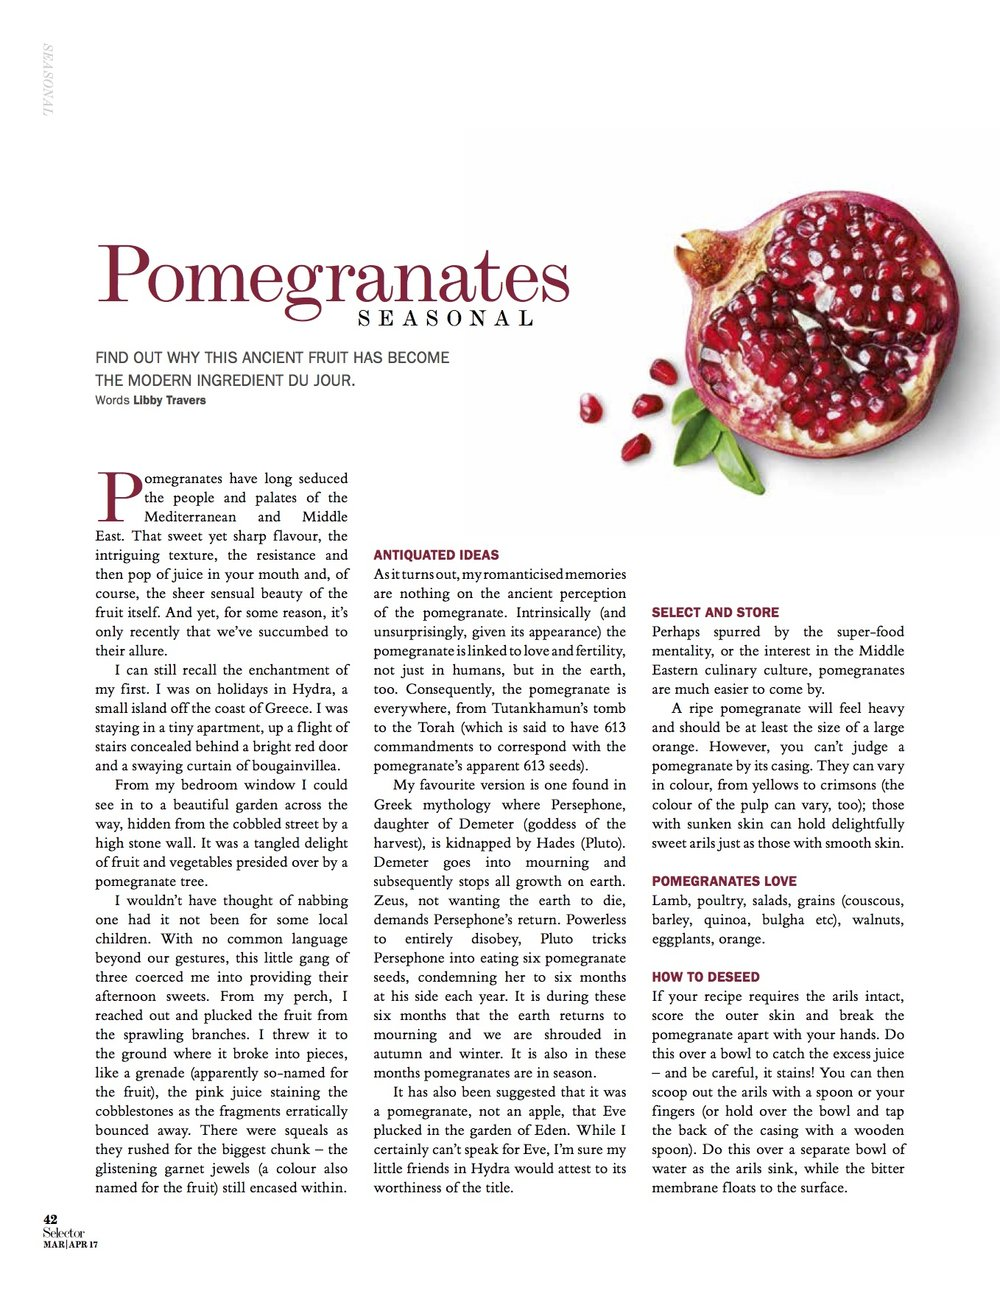 SeasonalPomegranates.jpg